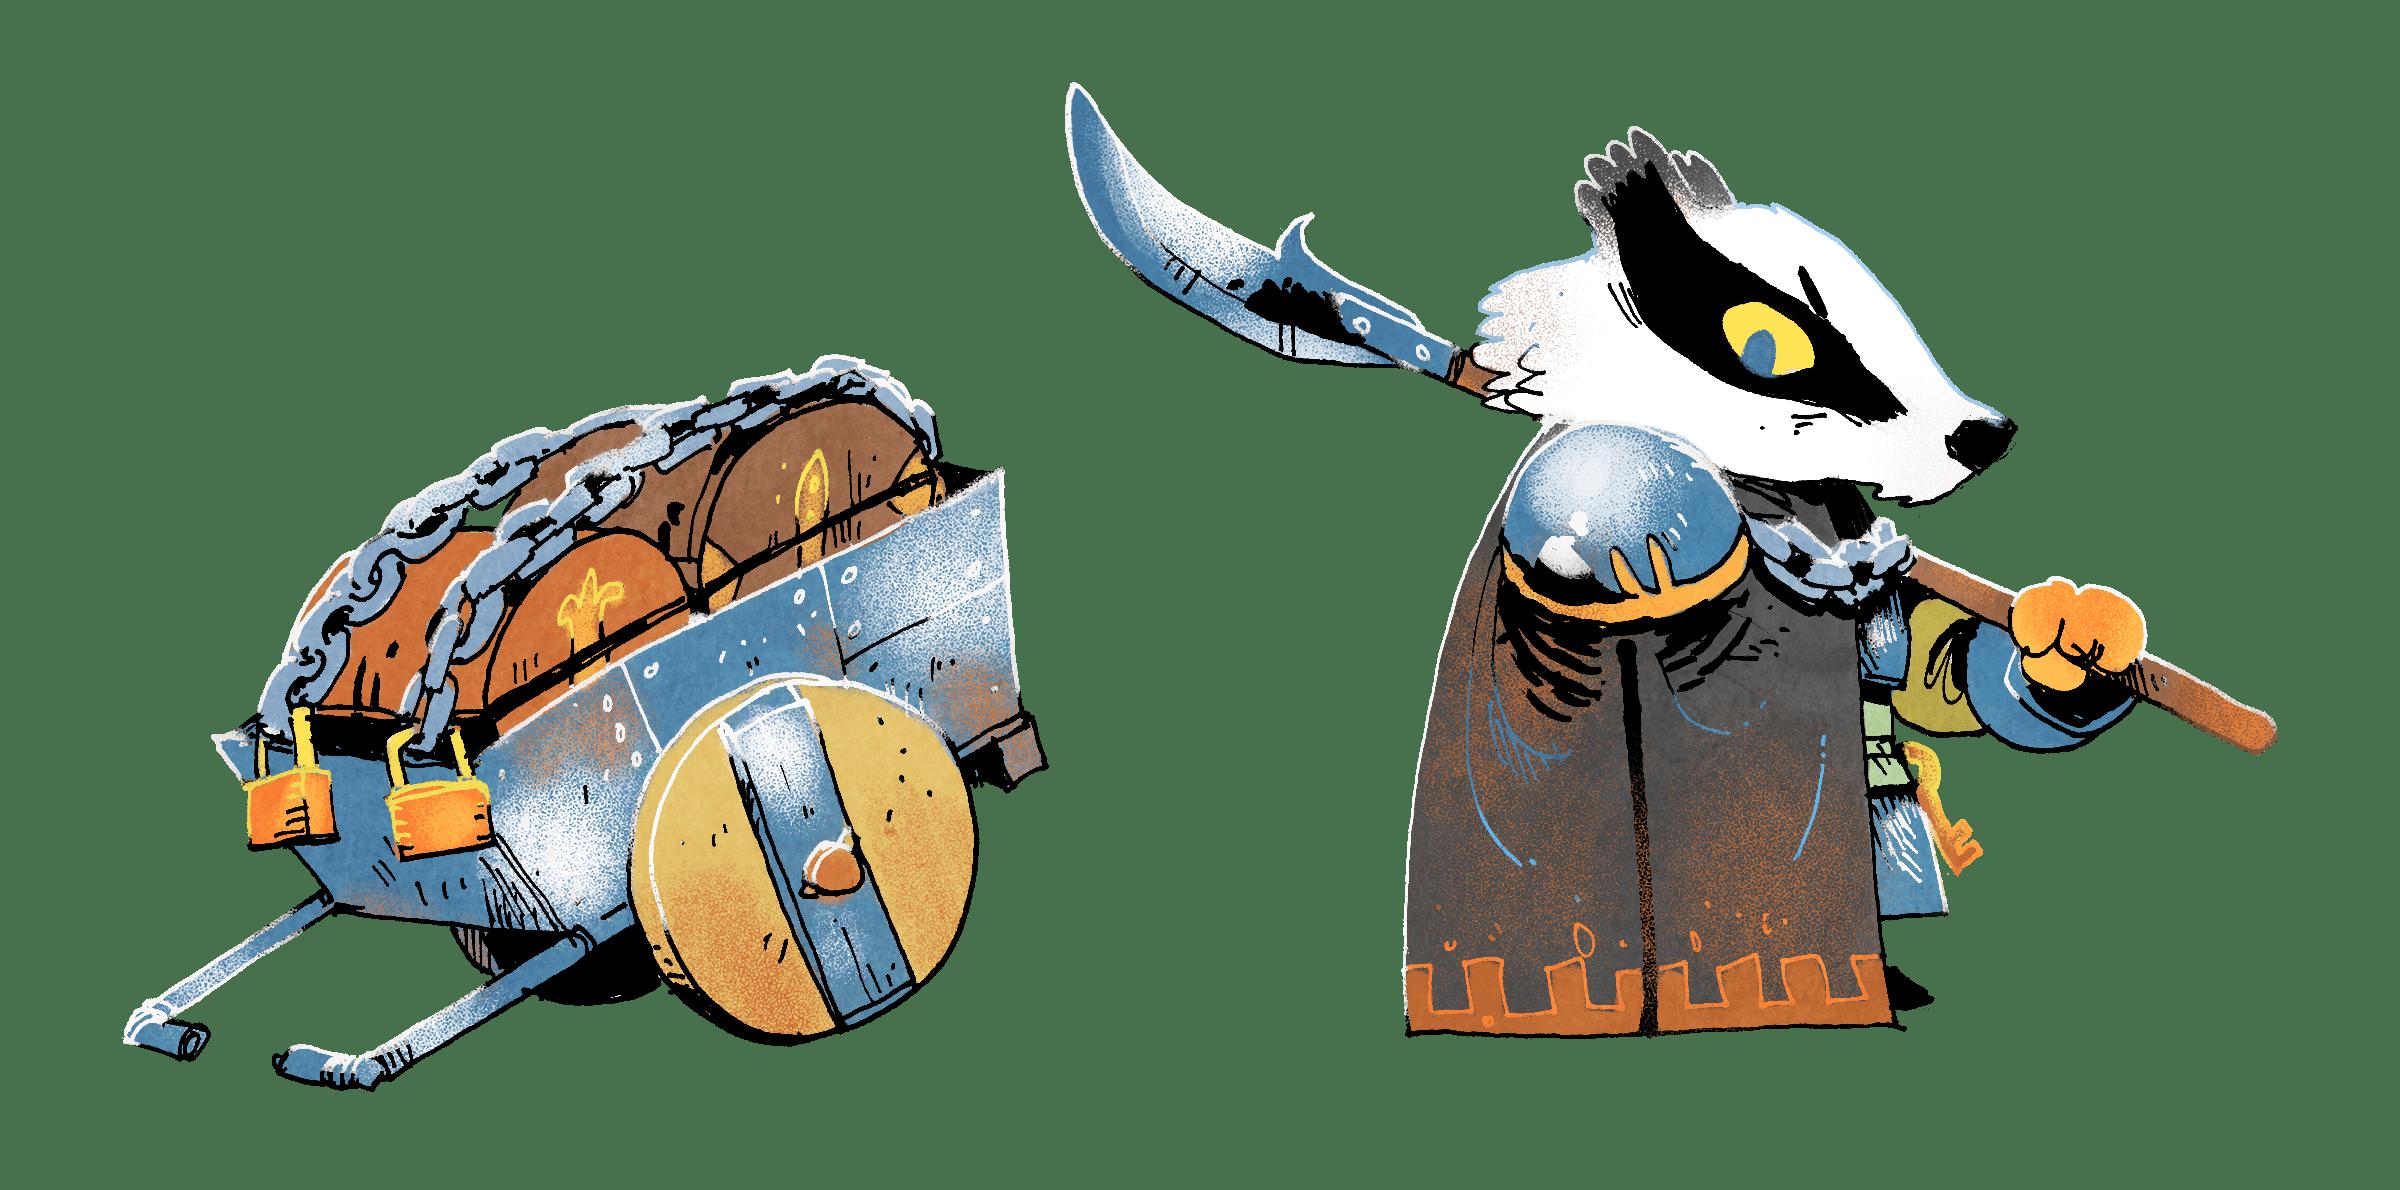 Art for the Badger faction by Kyle Ferrin